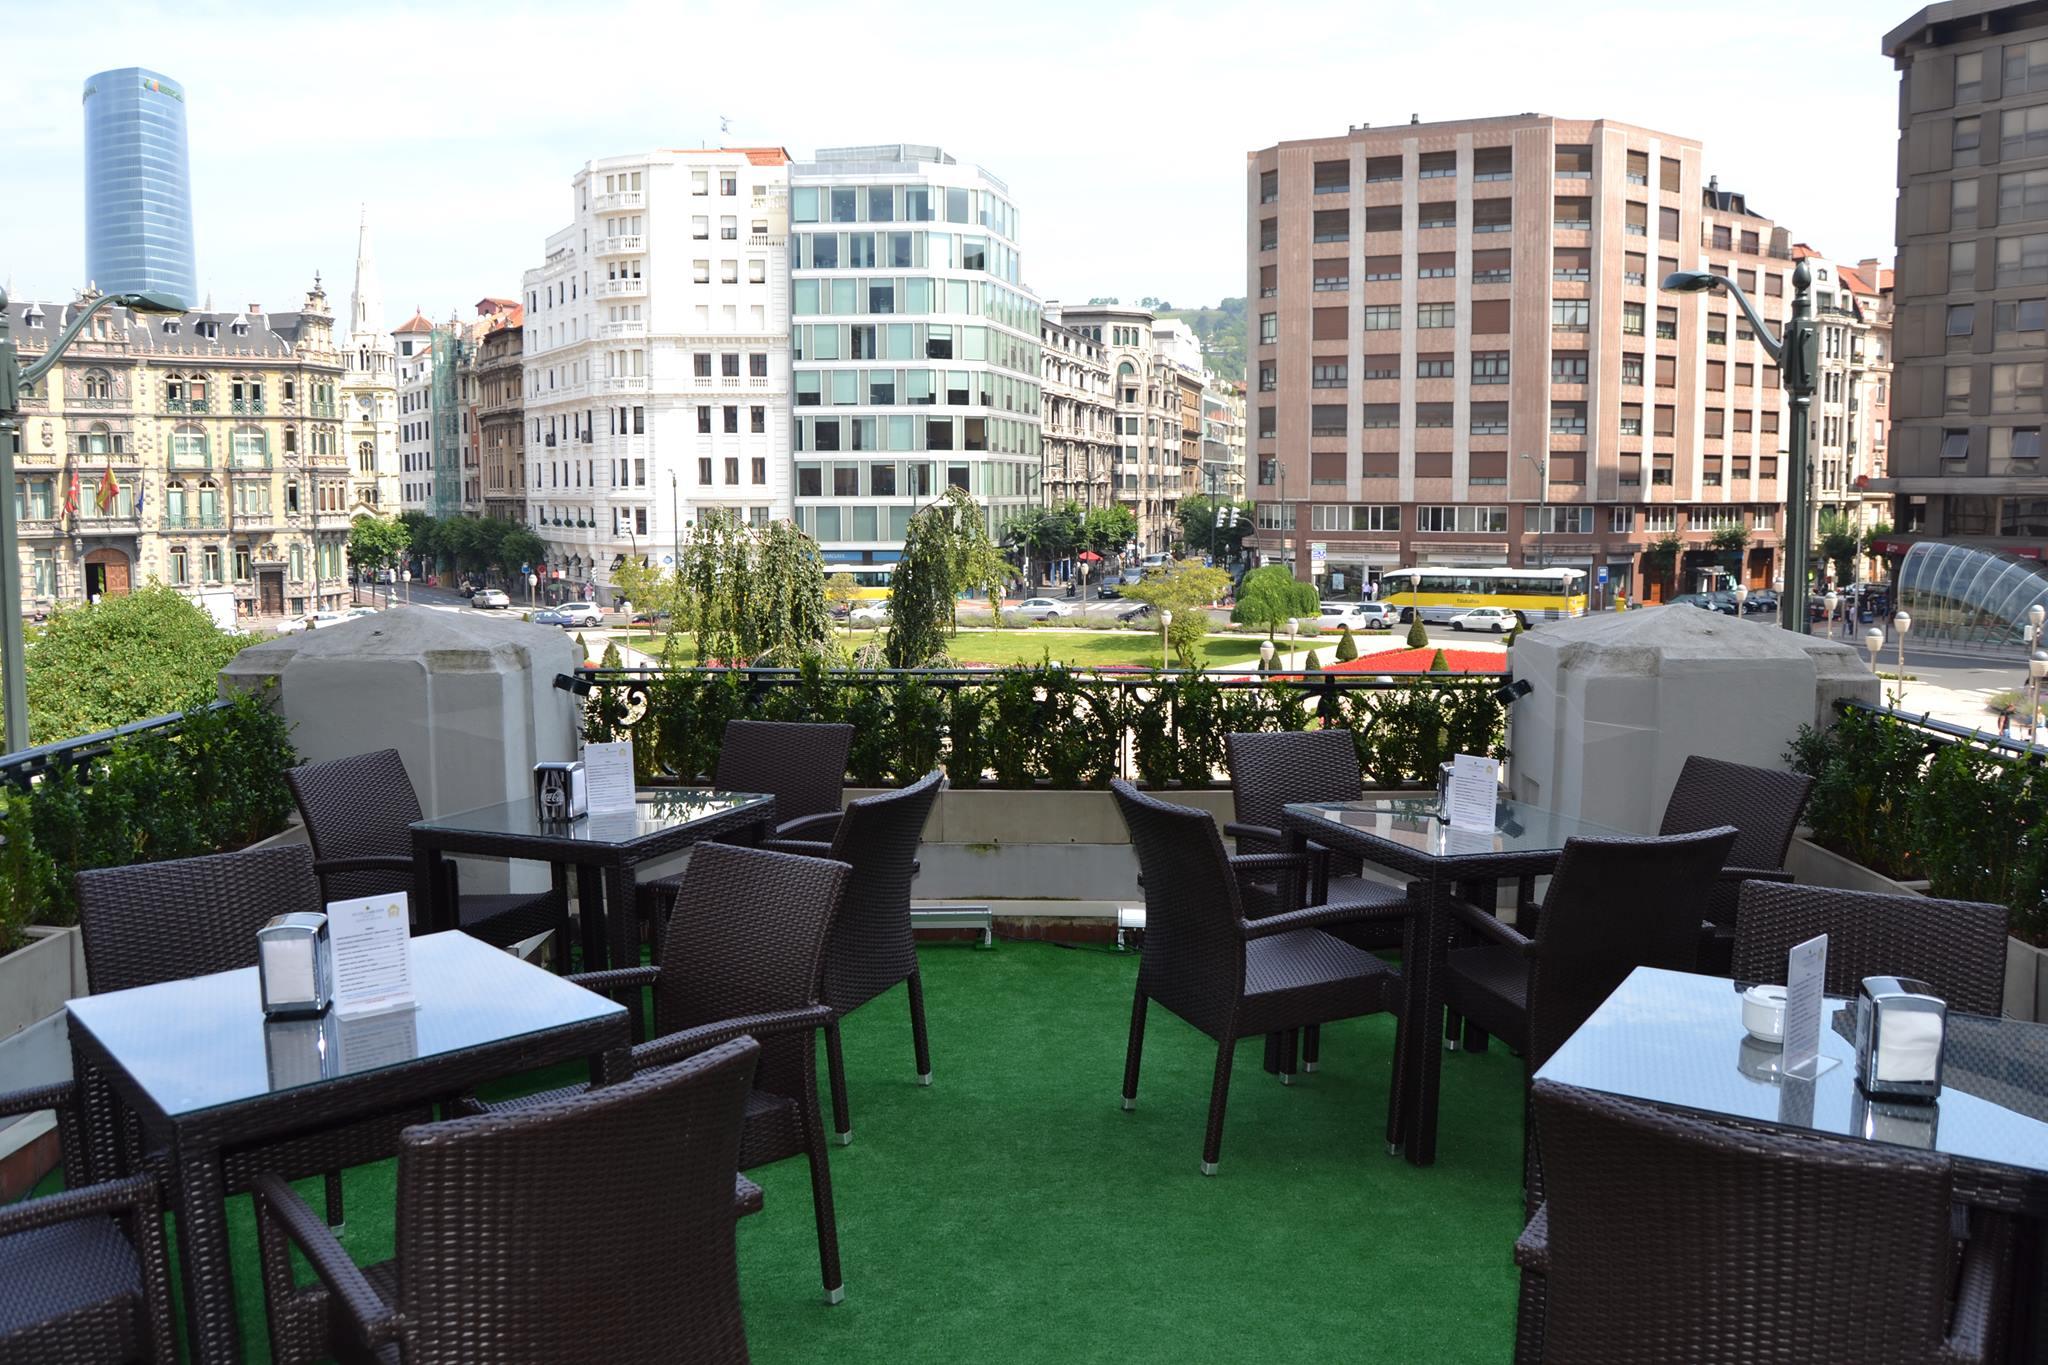 Las 6 terrazas con mejores vistas de bilbaobilbaoclick for Pisos con terraza en bilbao